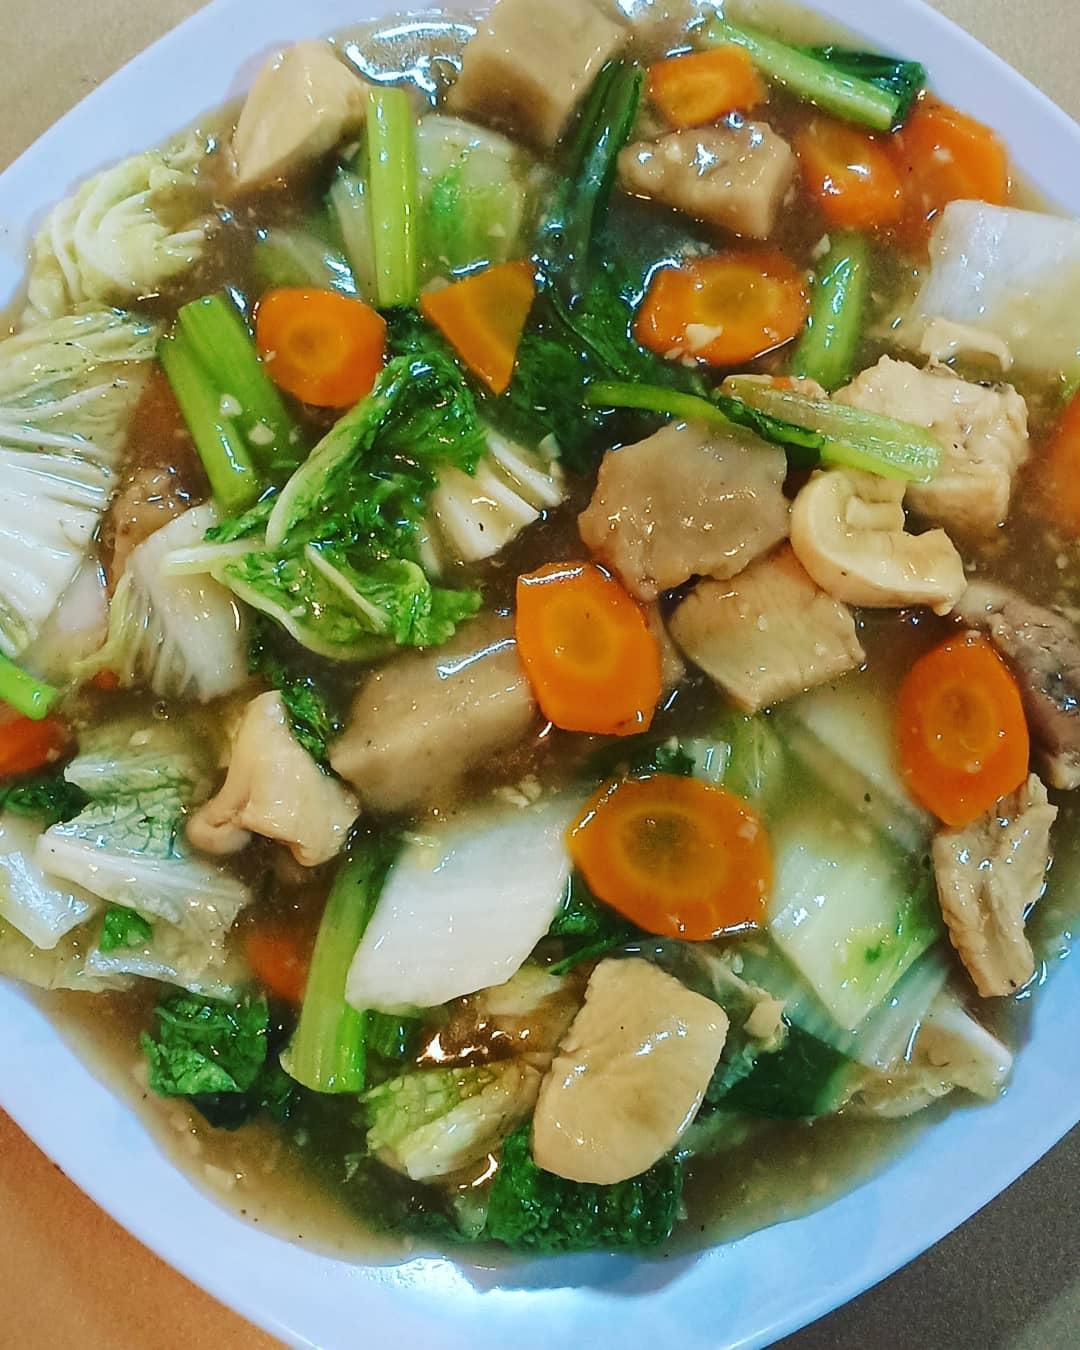 Resep Masak Capcay Sayur : resep, masak, capcay, sayur, Resep, Capcay